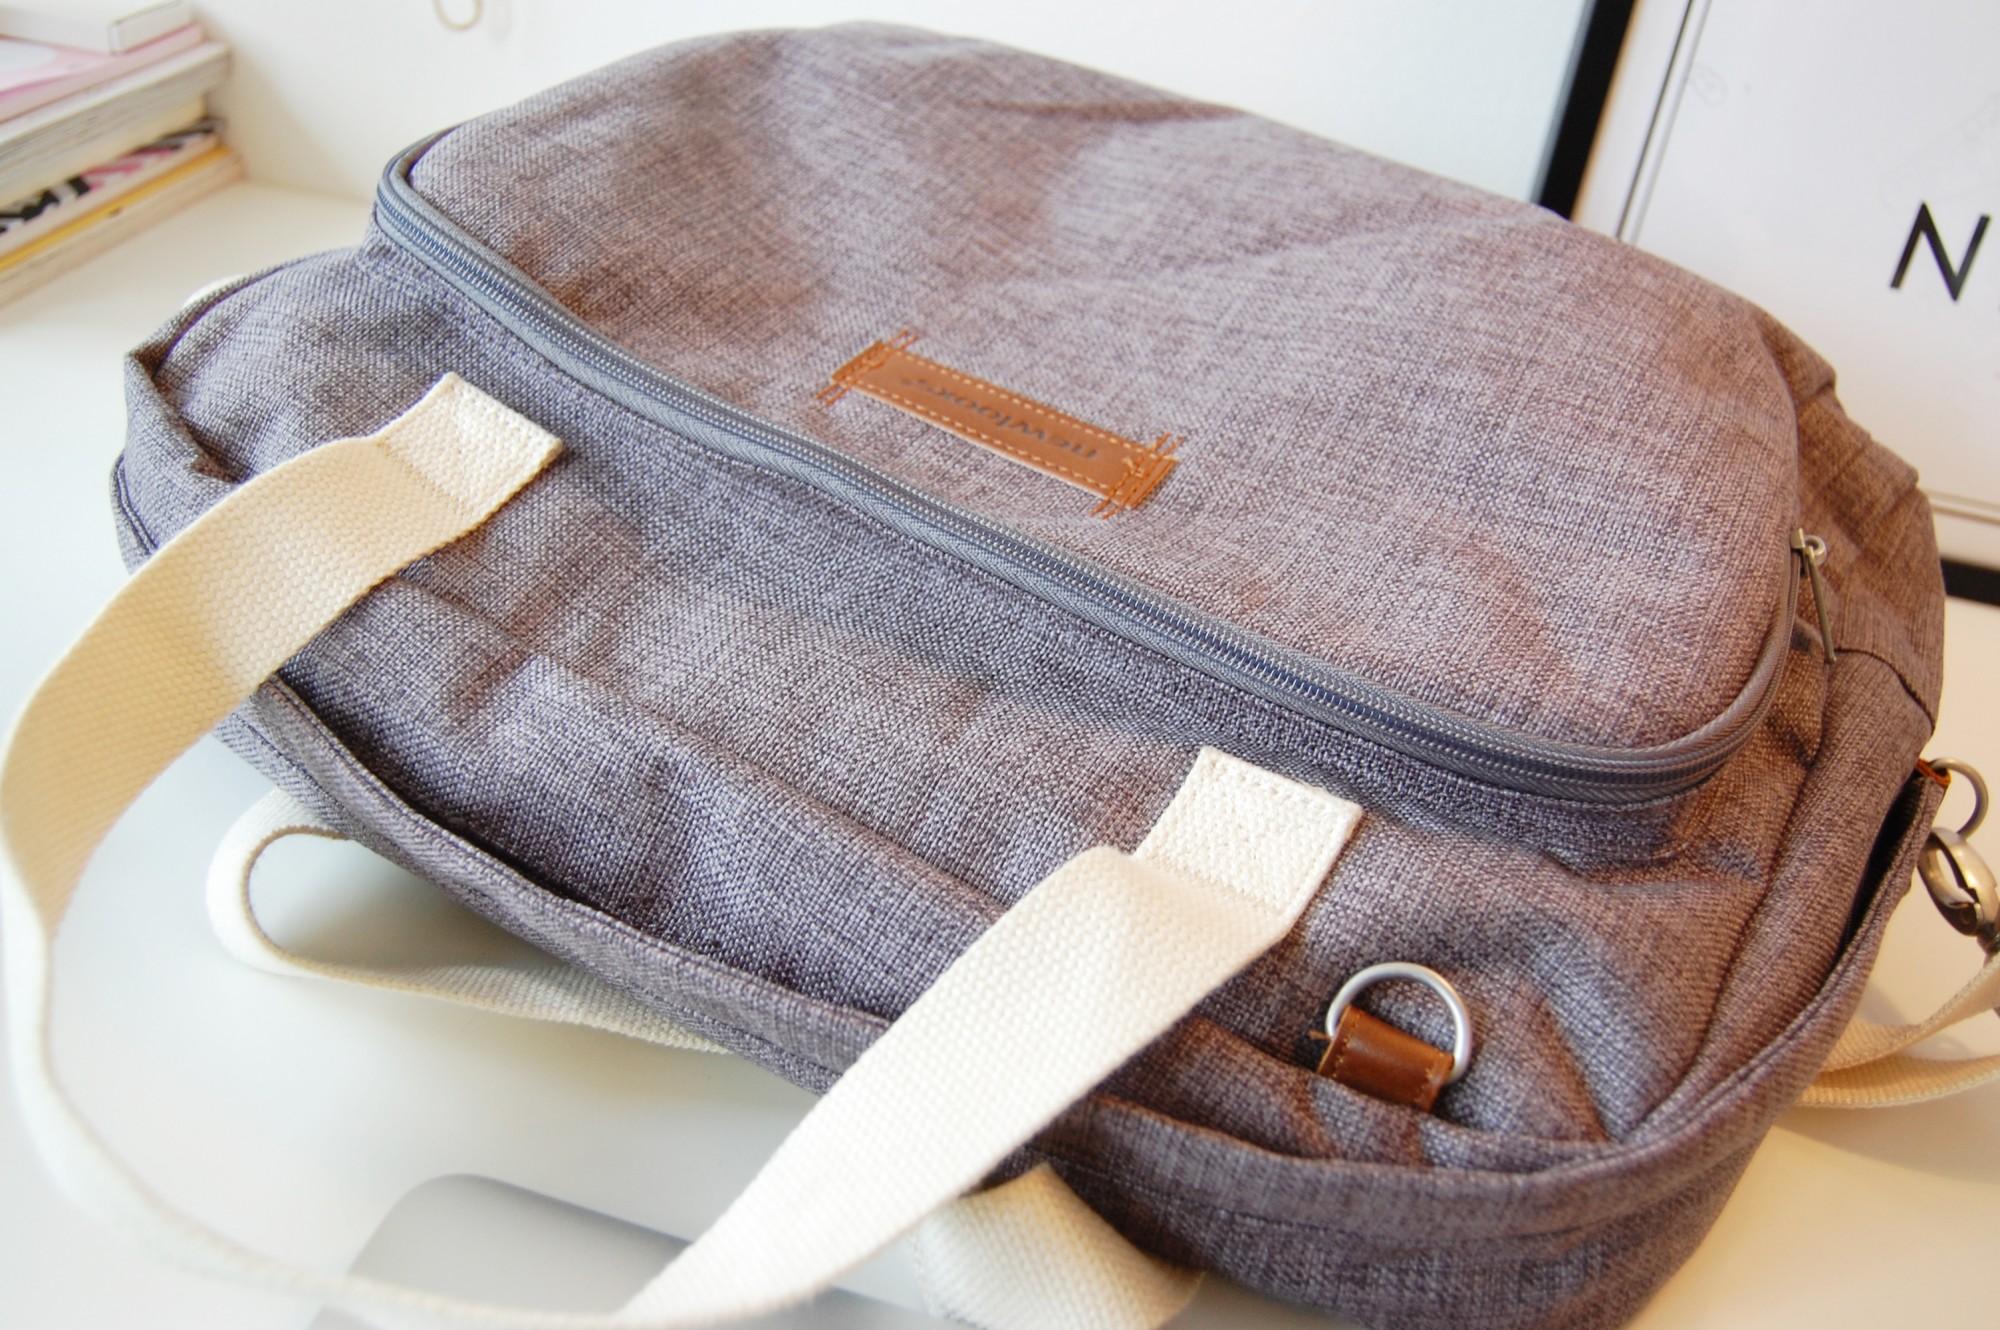 New Looxs Postino Grey bag